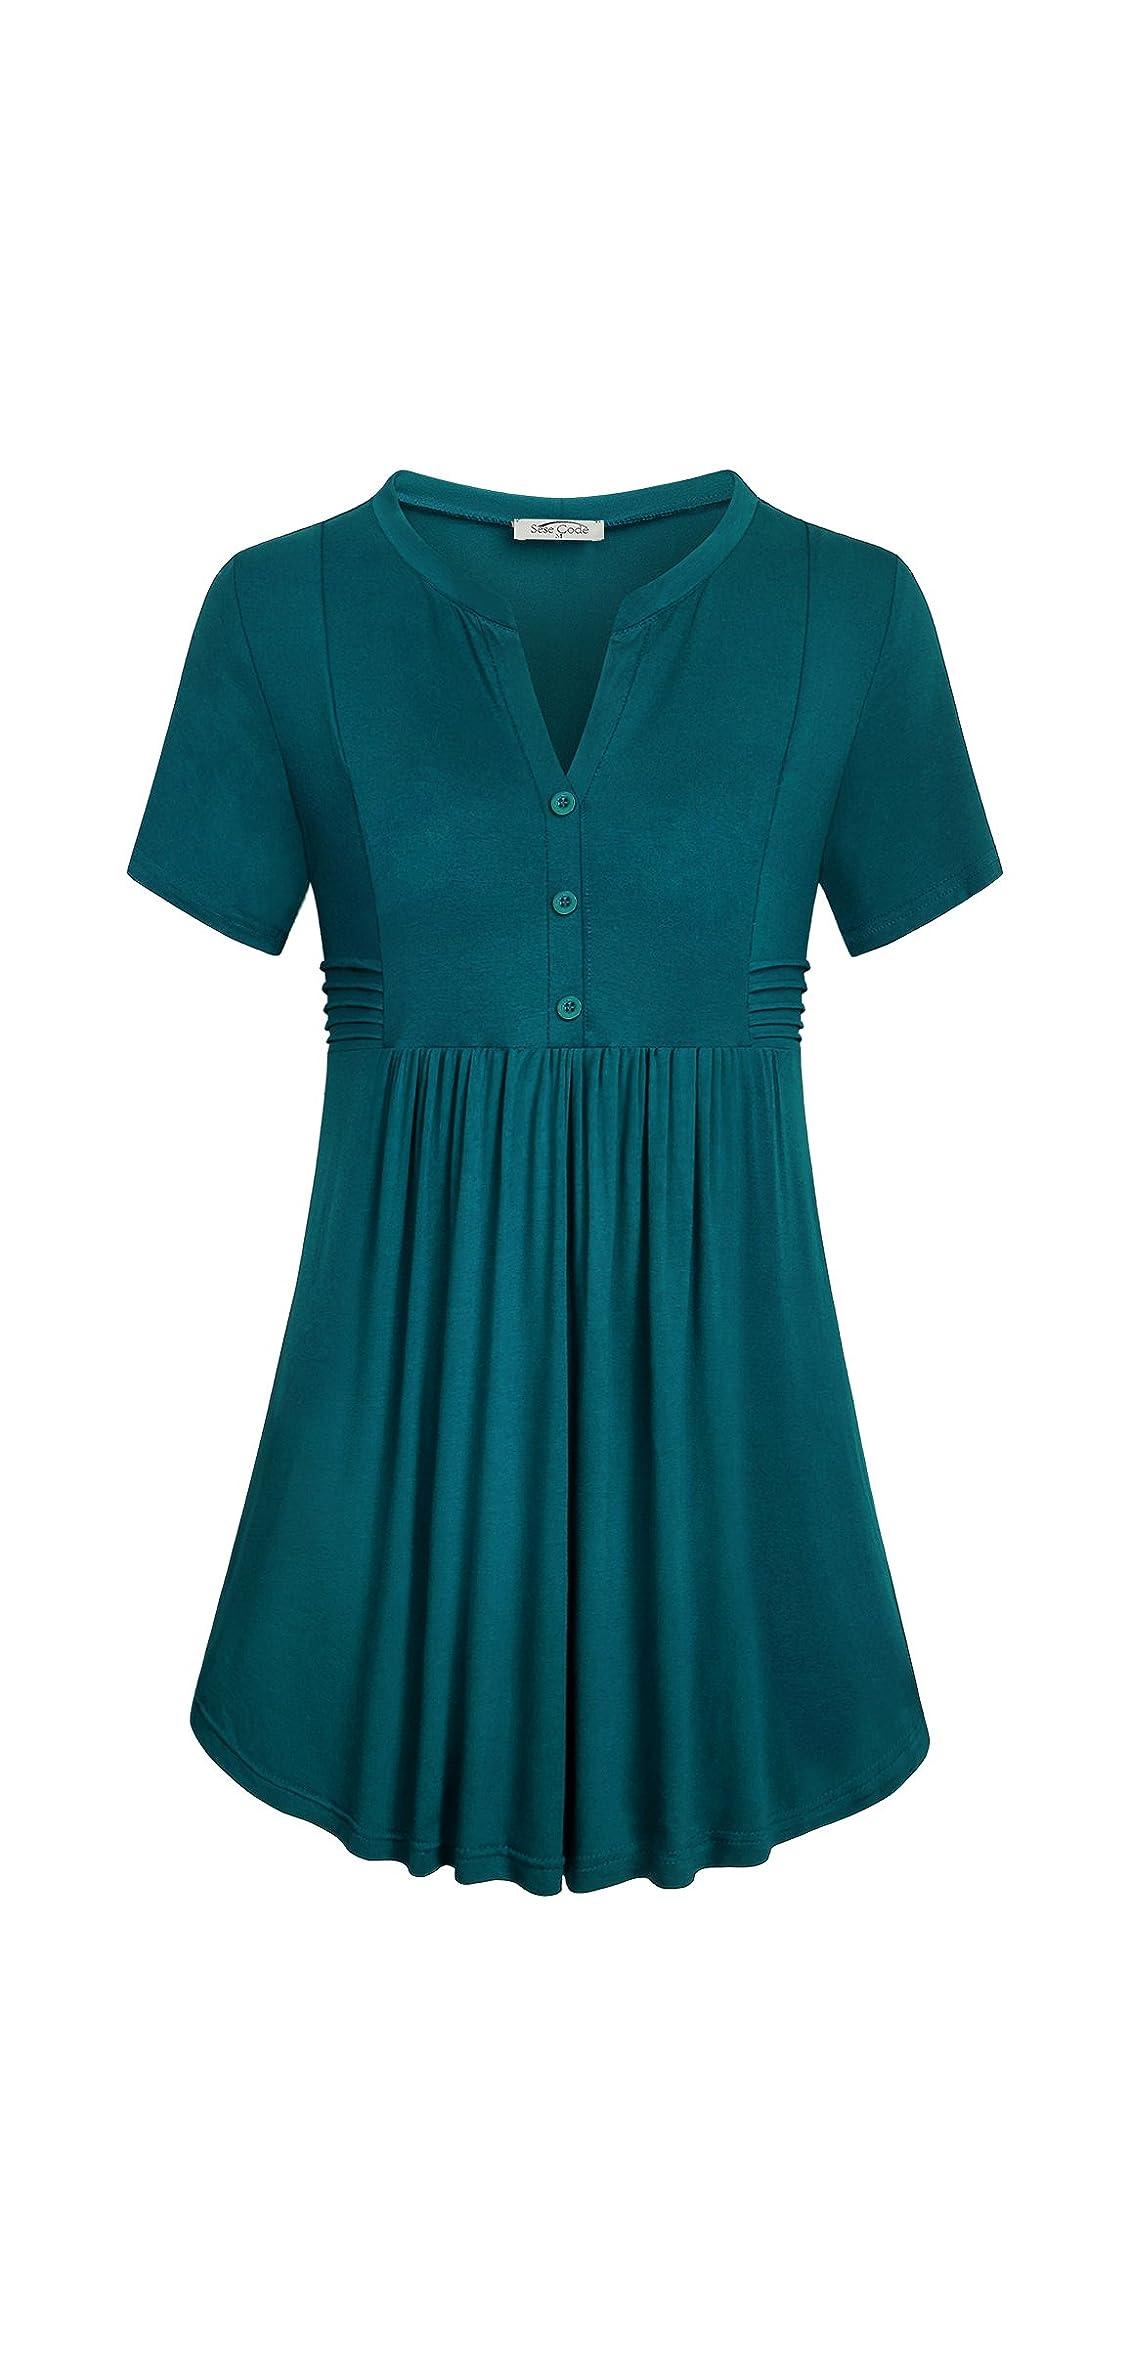 Women's Short Sleeve Notch V Neck Empire Waist Tunic